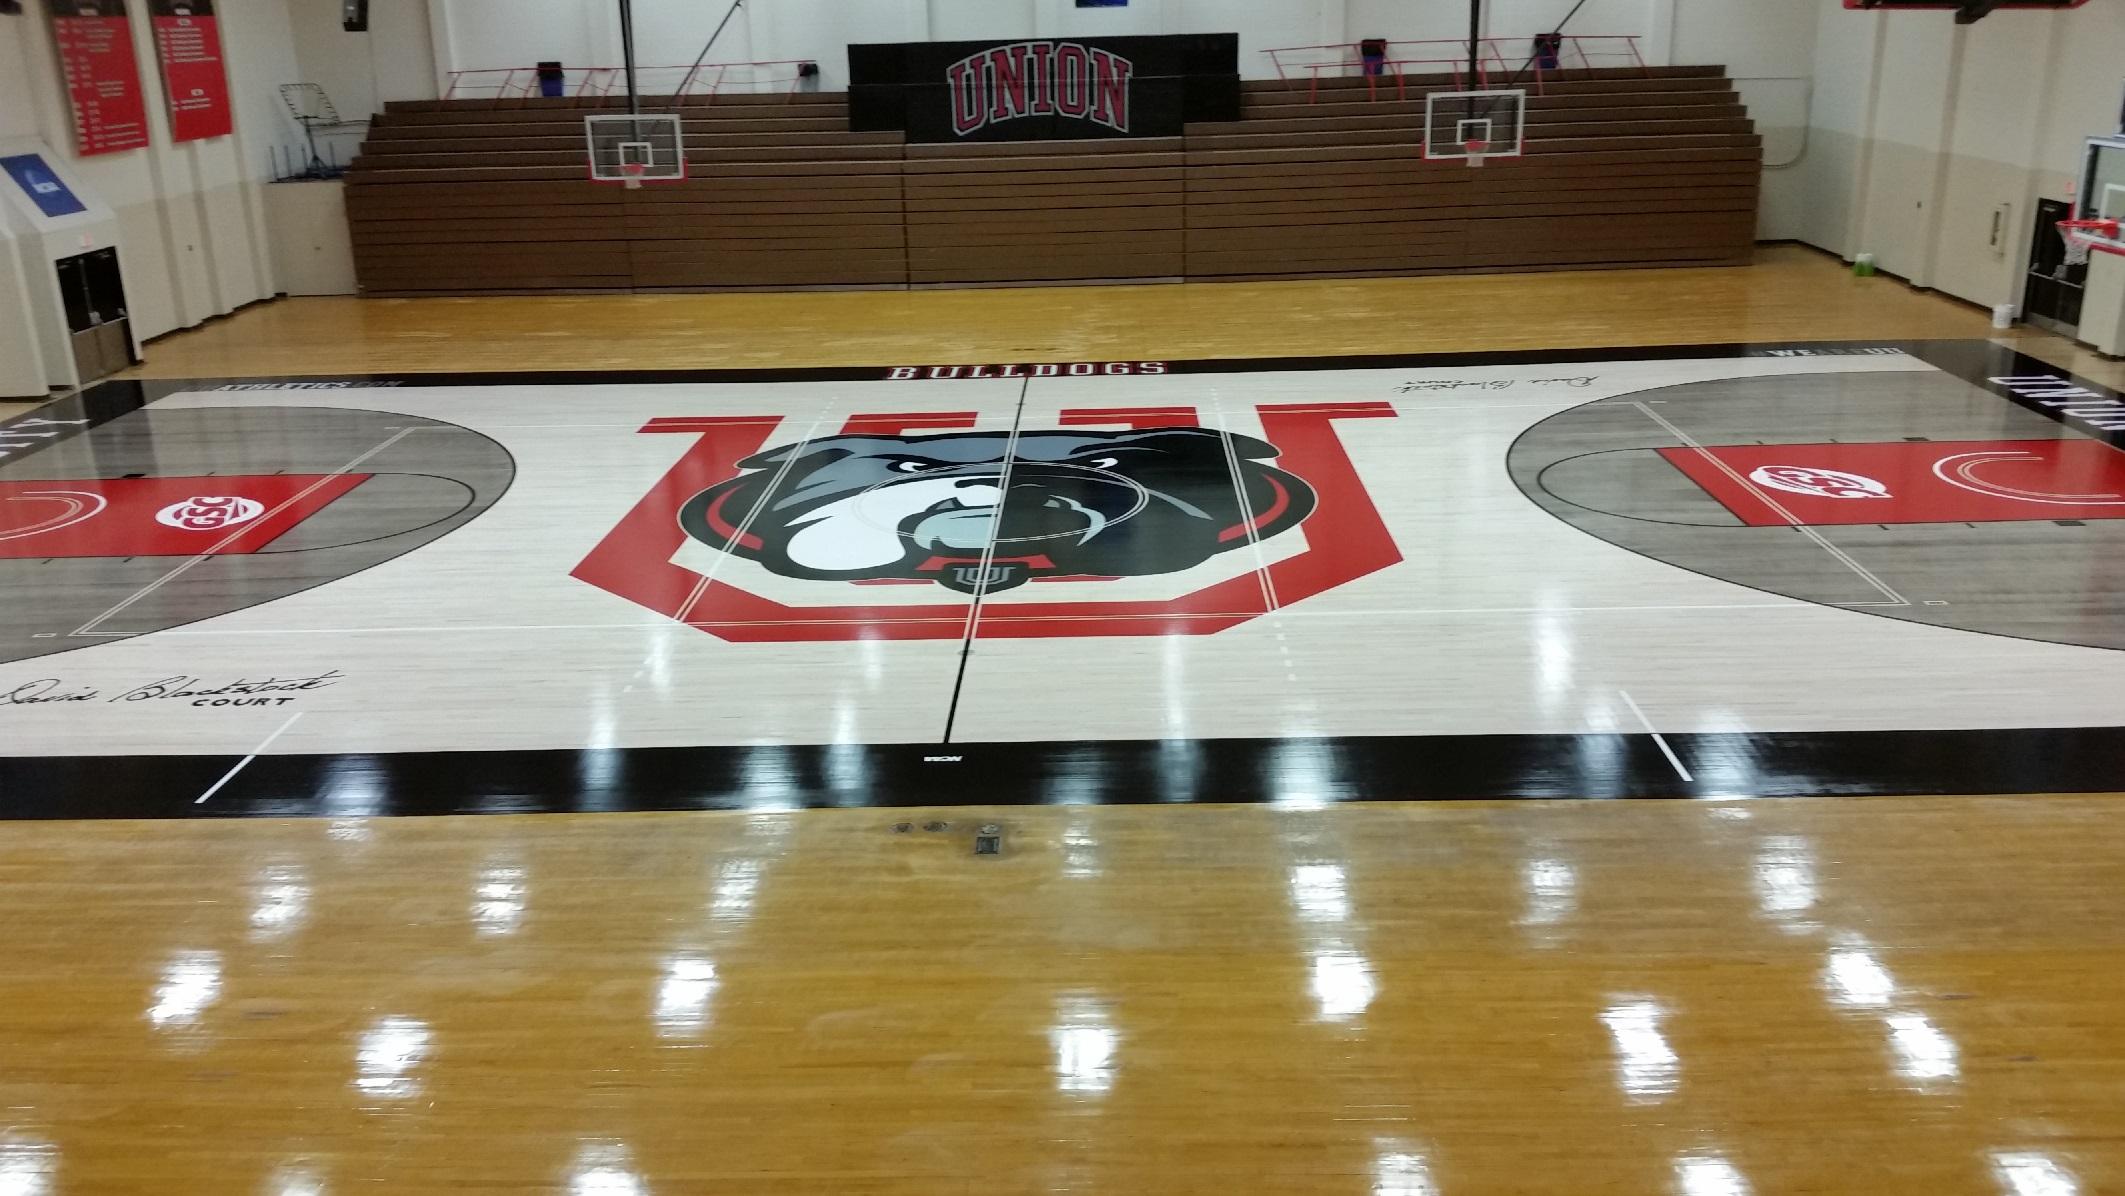 union university gym masters basketball courts